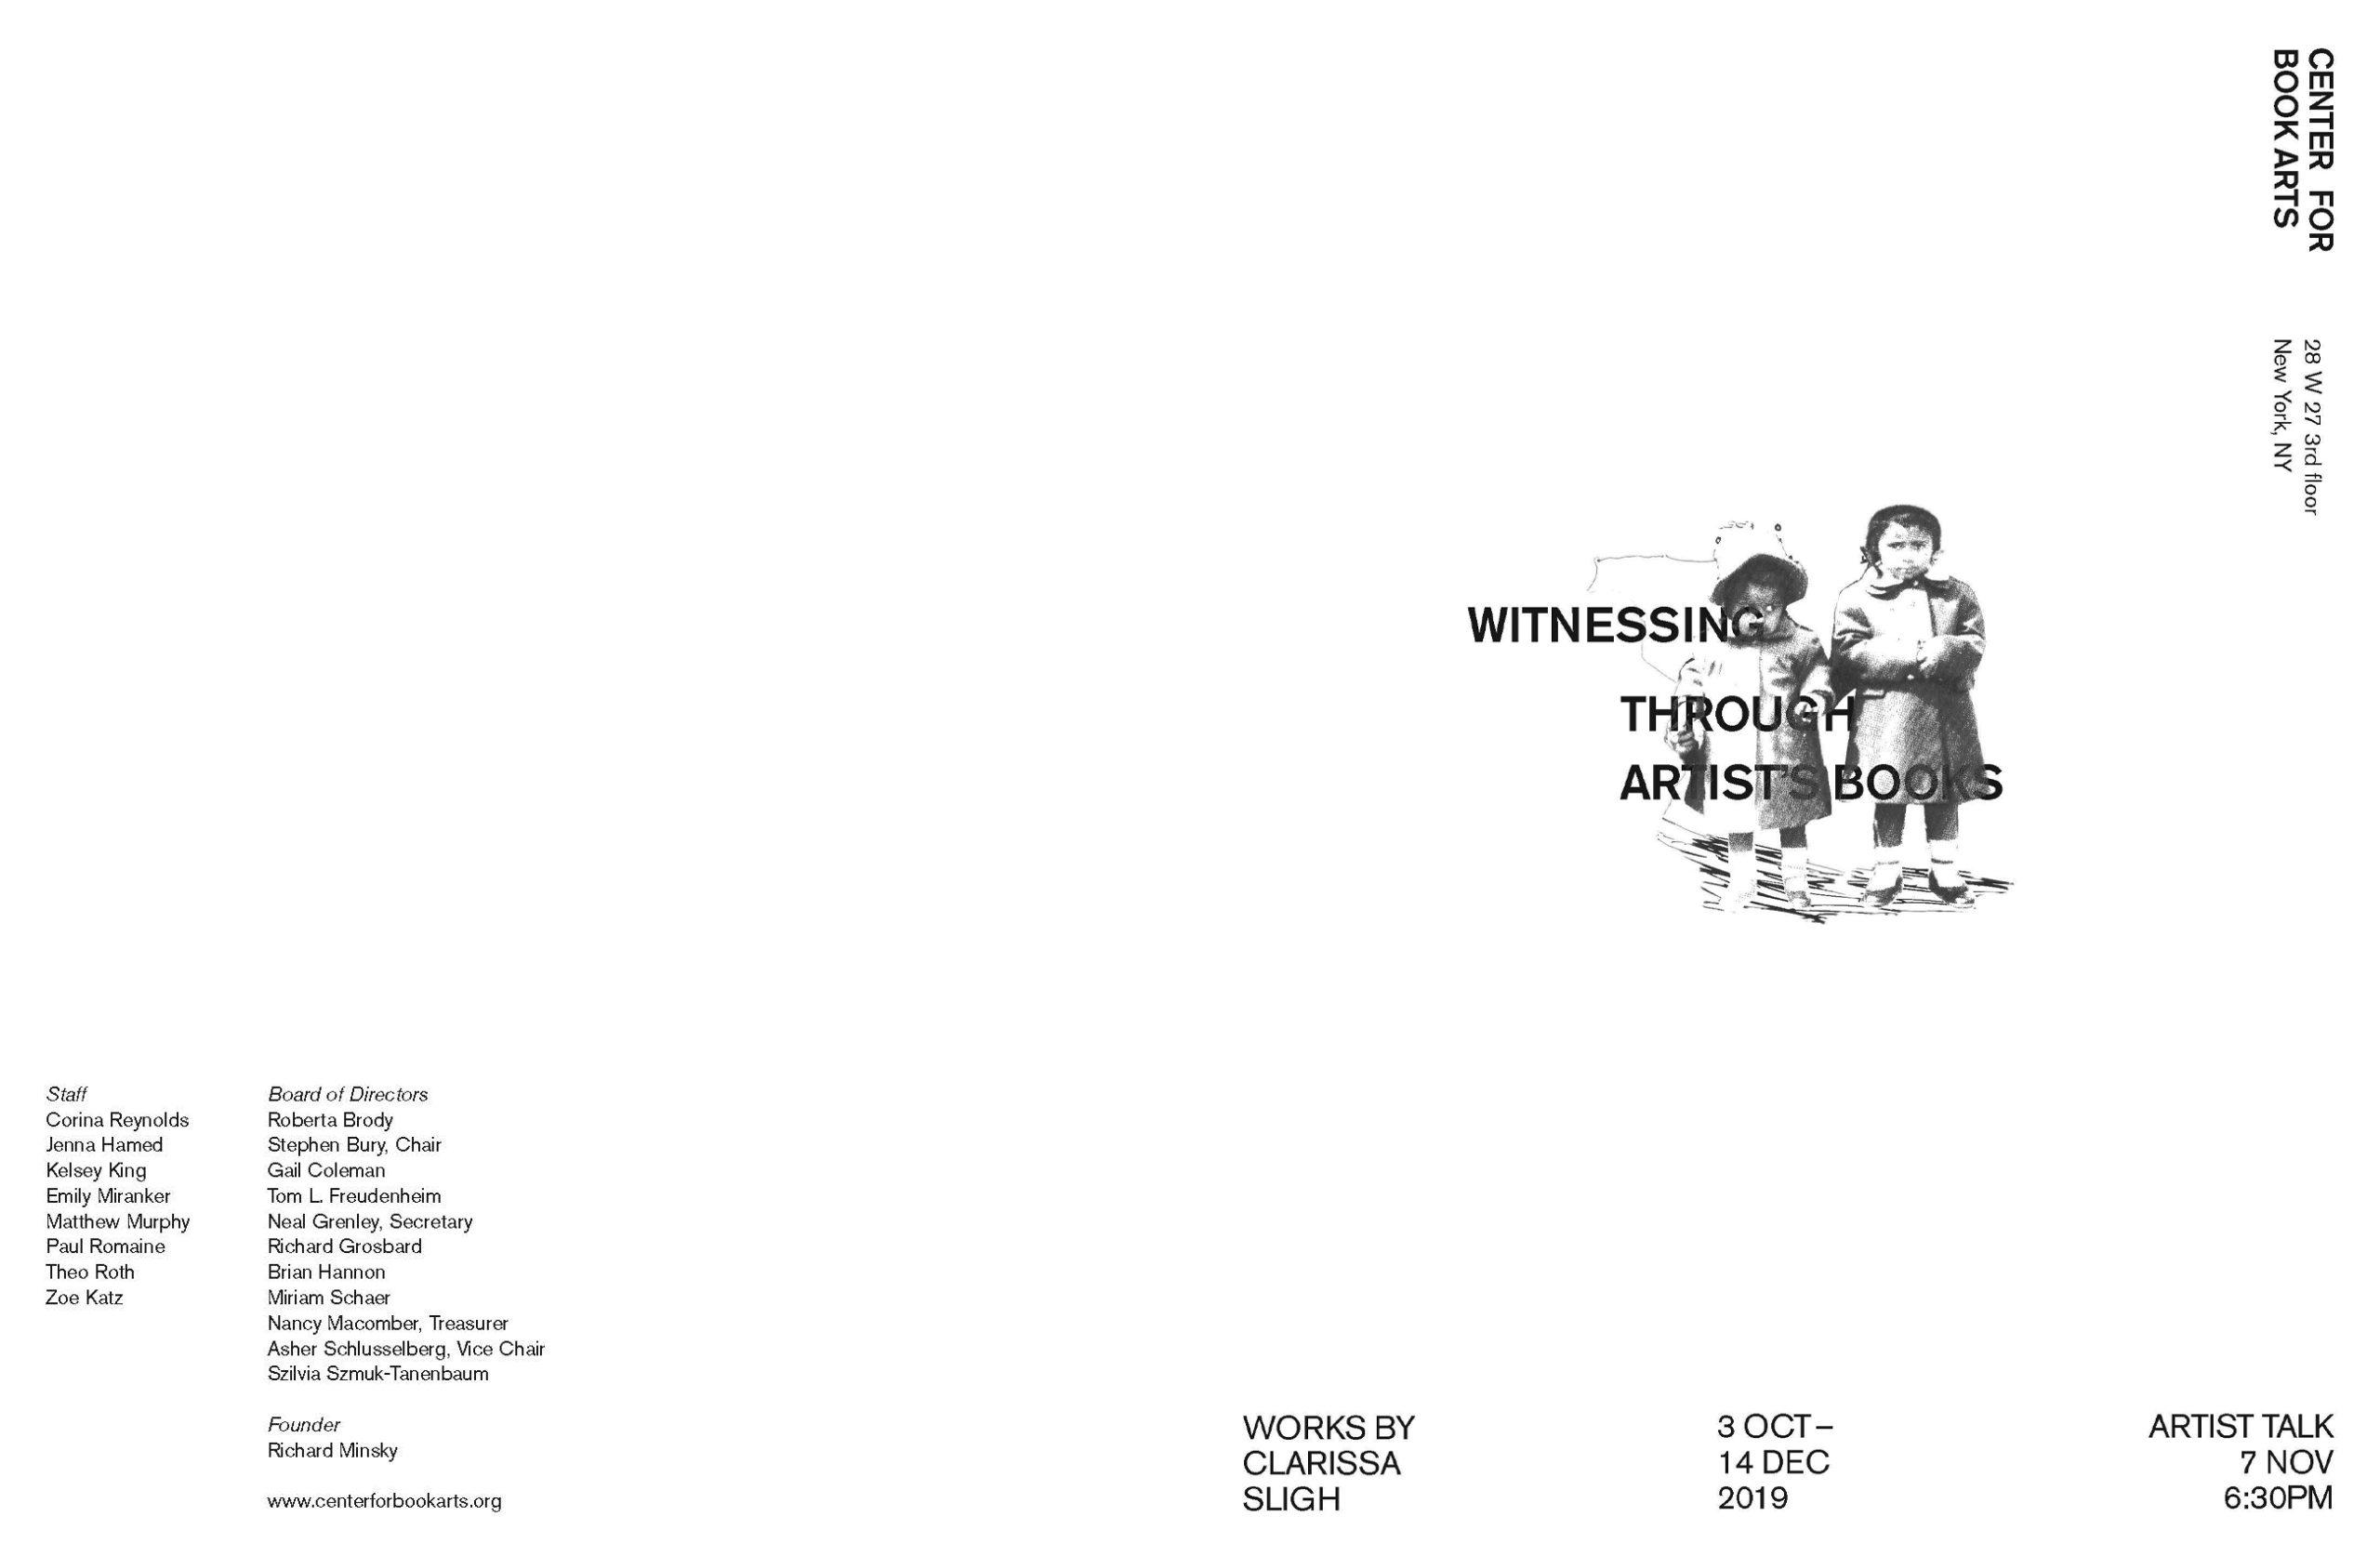 page 2 & 3 of Witnessing Through Artist's Books: Clarissa Sligh brochure